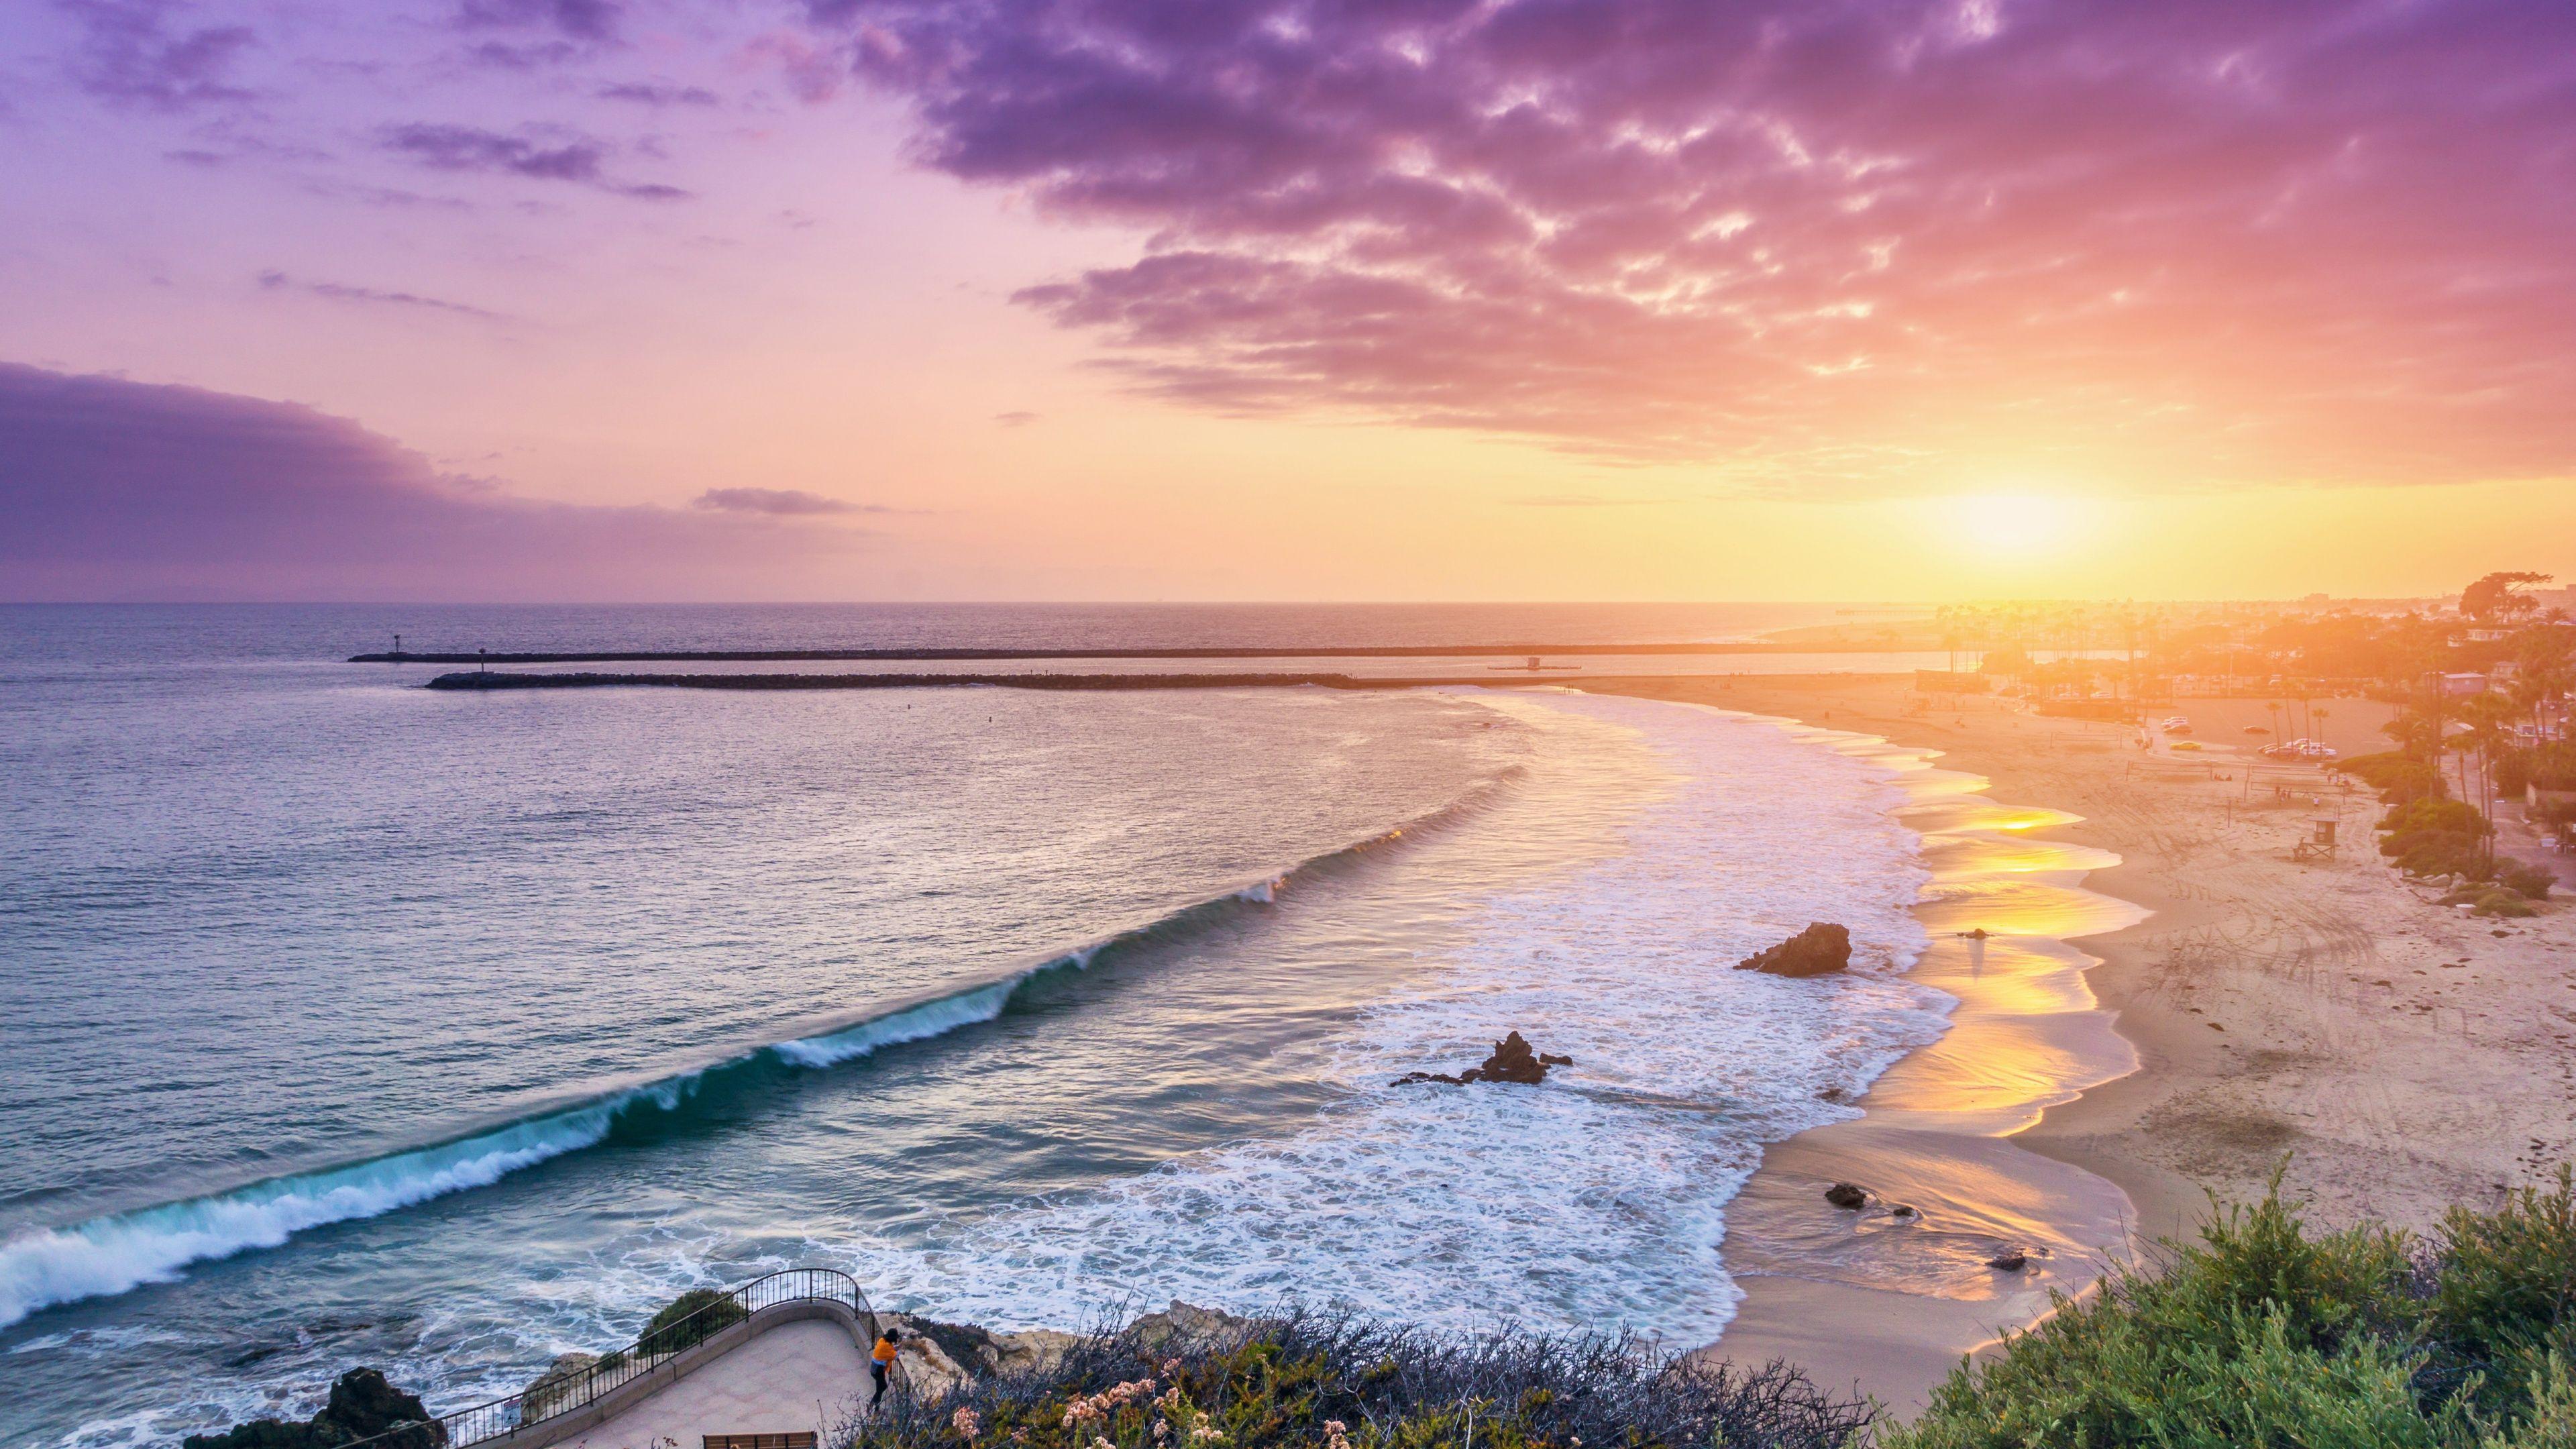 Corona Del Mar Newport Beach Wallpapers Hd Wallpapers Beach Sunset Wallpaper Beach Wallpaper Beach Background